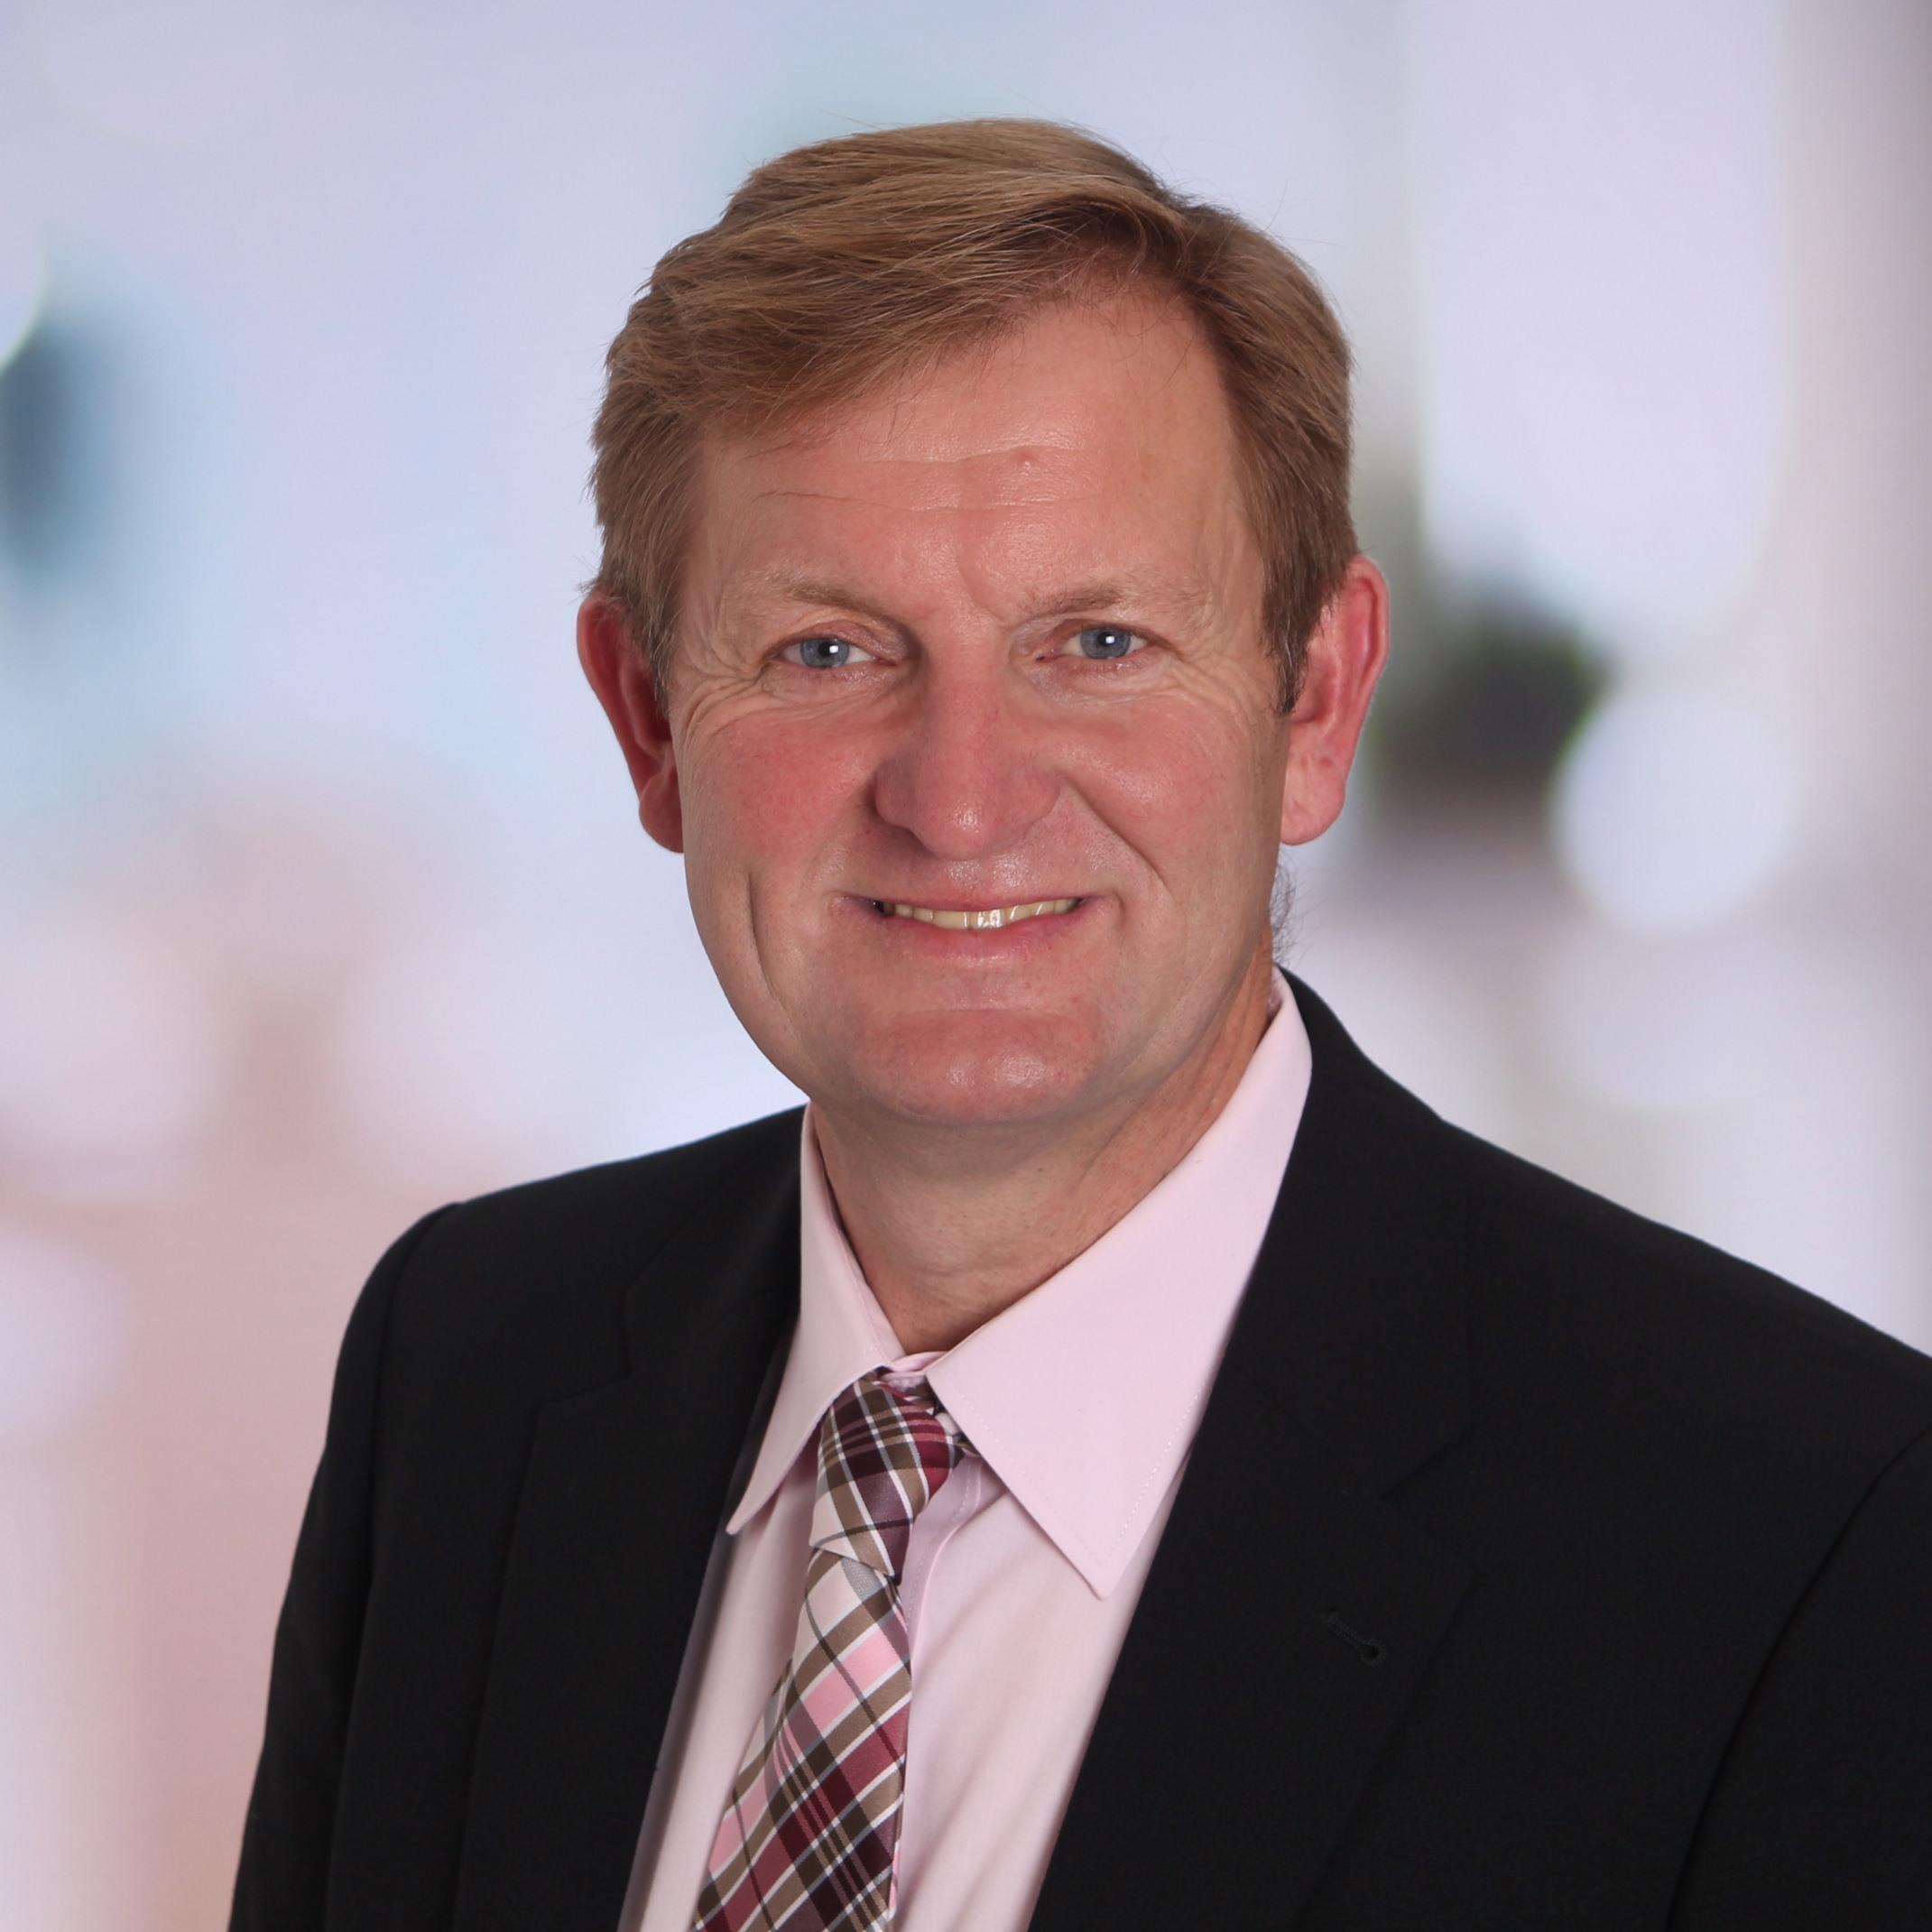 Bernd Janssen